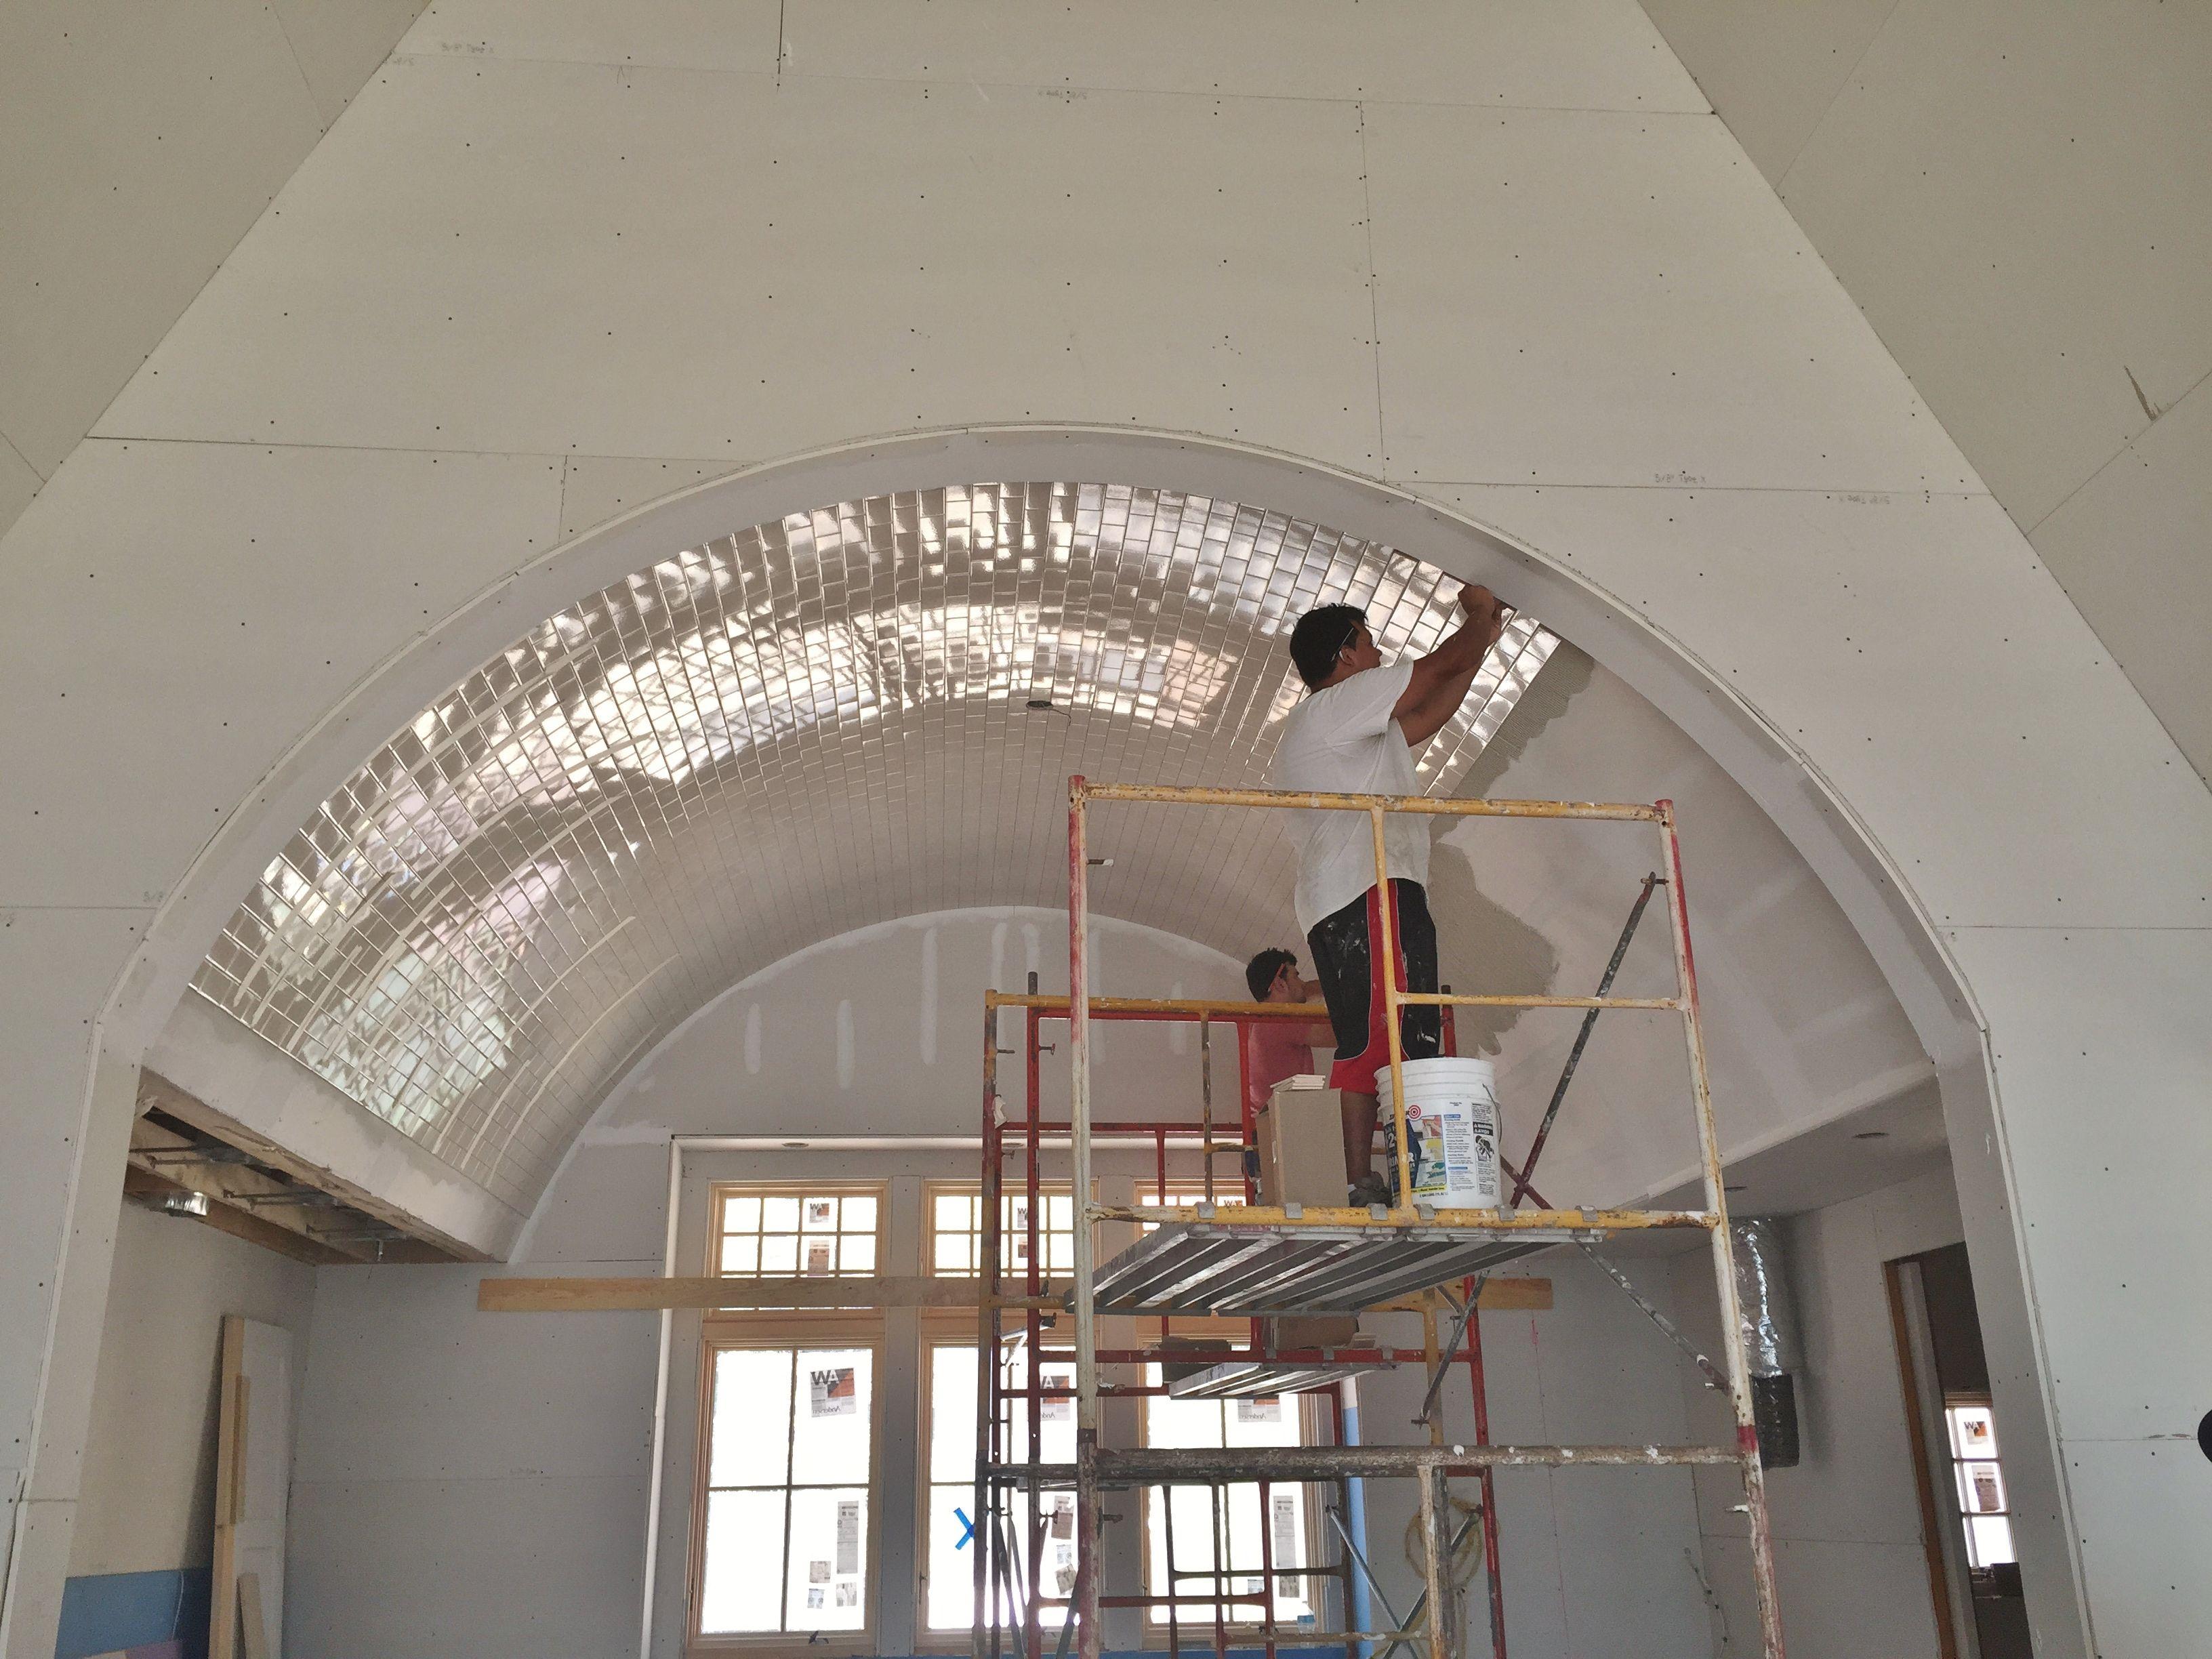 Barrel vaulted kitchen ceiling 3x6 subway tile tile jobs weve barrel vaulted kitchen ceiling 3x6 subway tile dailygadgetfo Choice Image